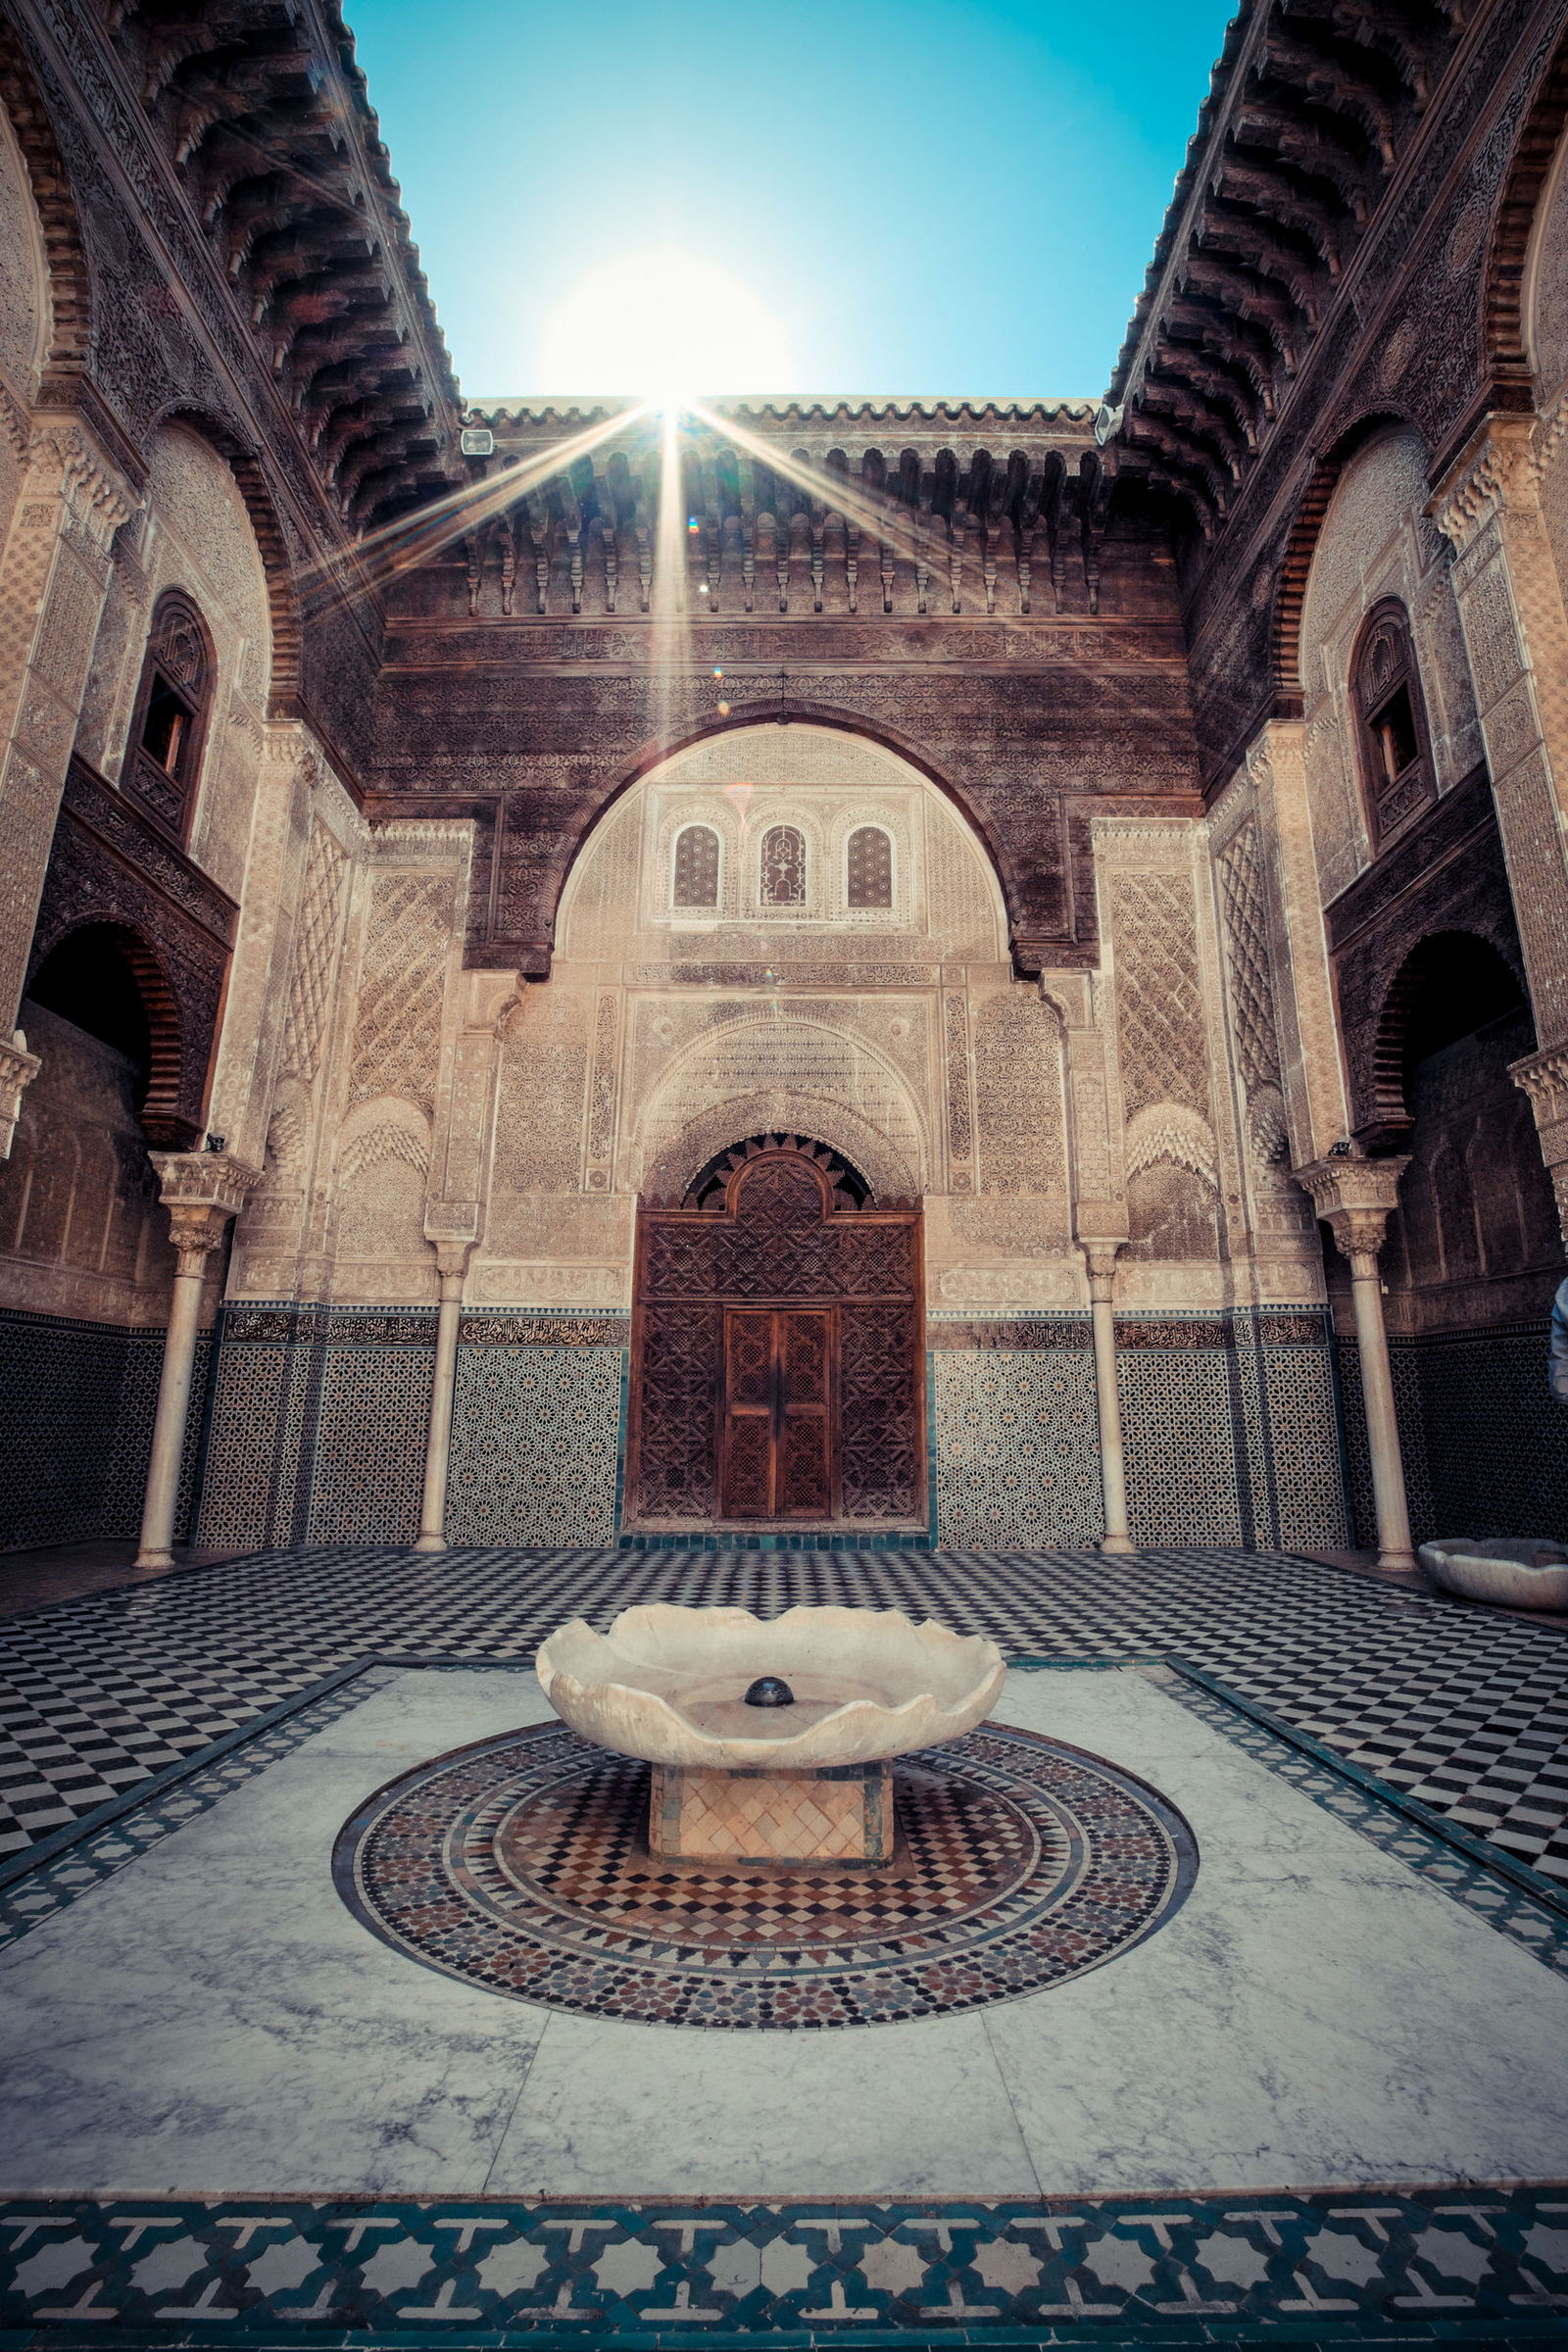 Madrasa Bou Inania Meknes